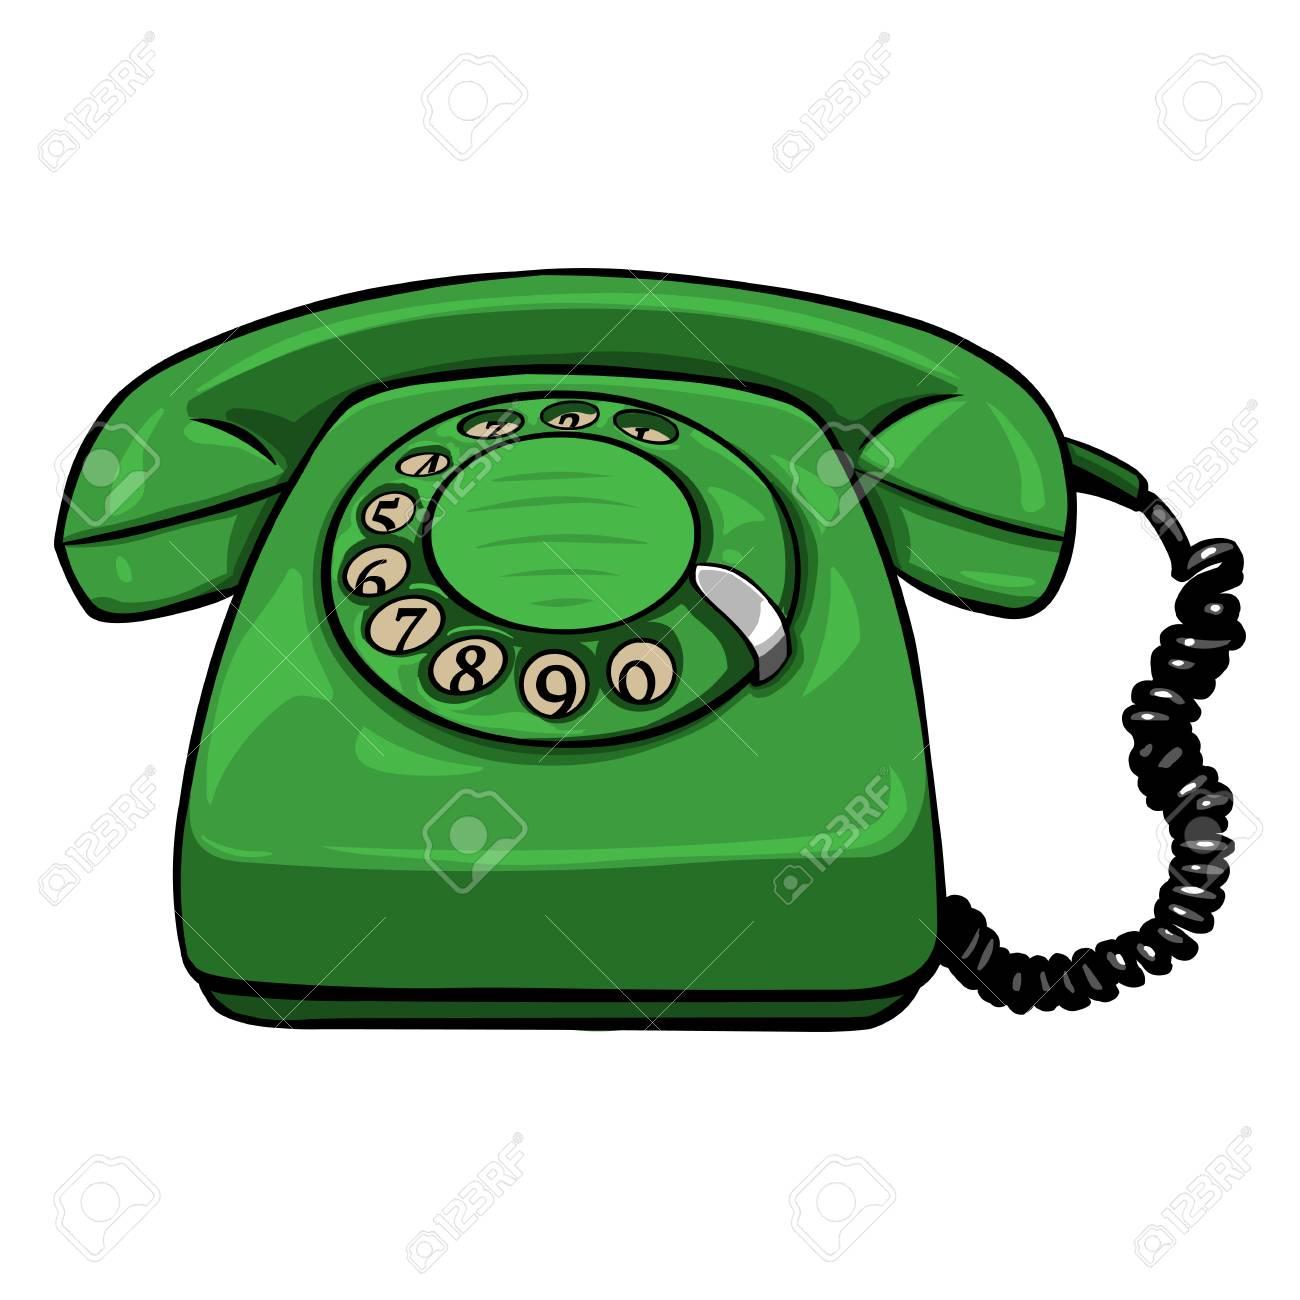 Vector Single Cartoon Retro Rotary Telephone on White Background